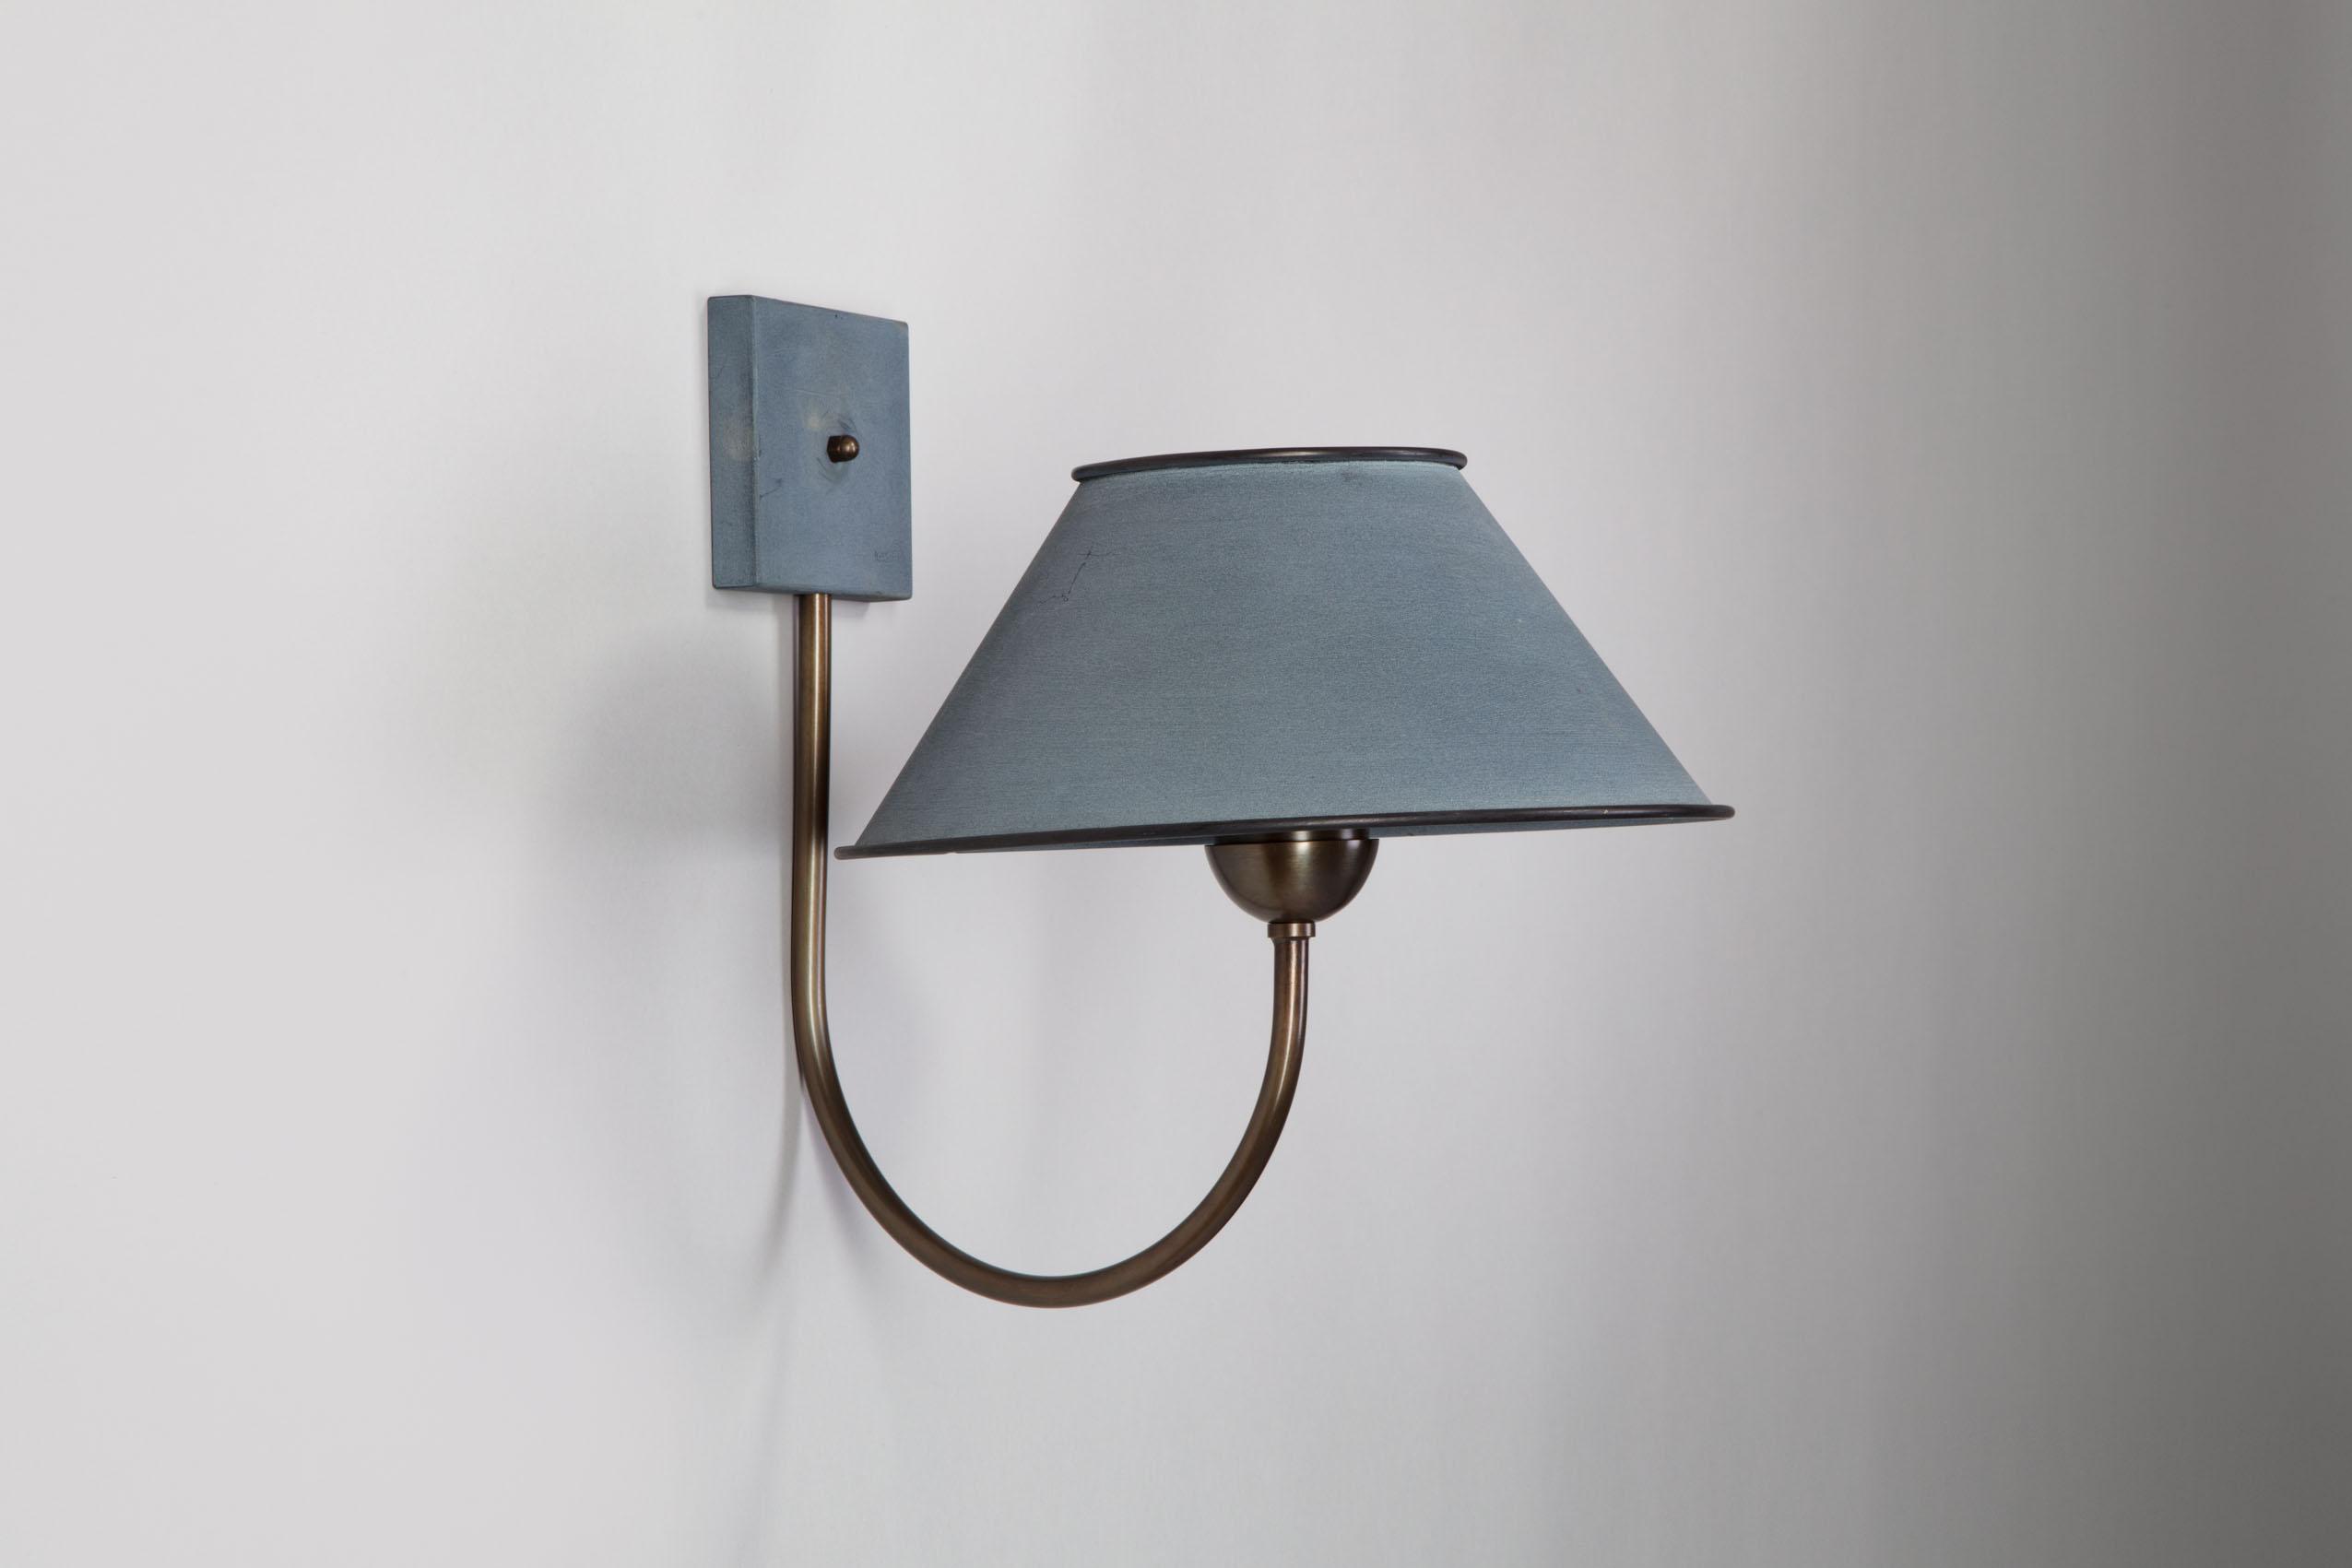 Coursive wall light 3453 lumart